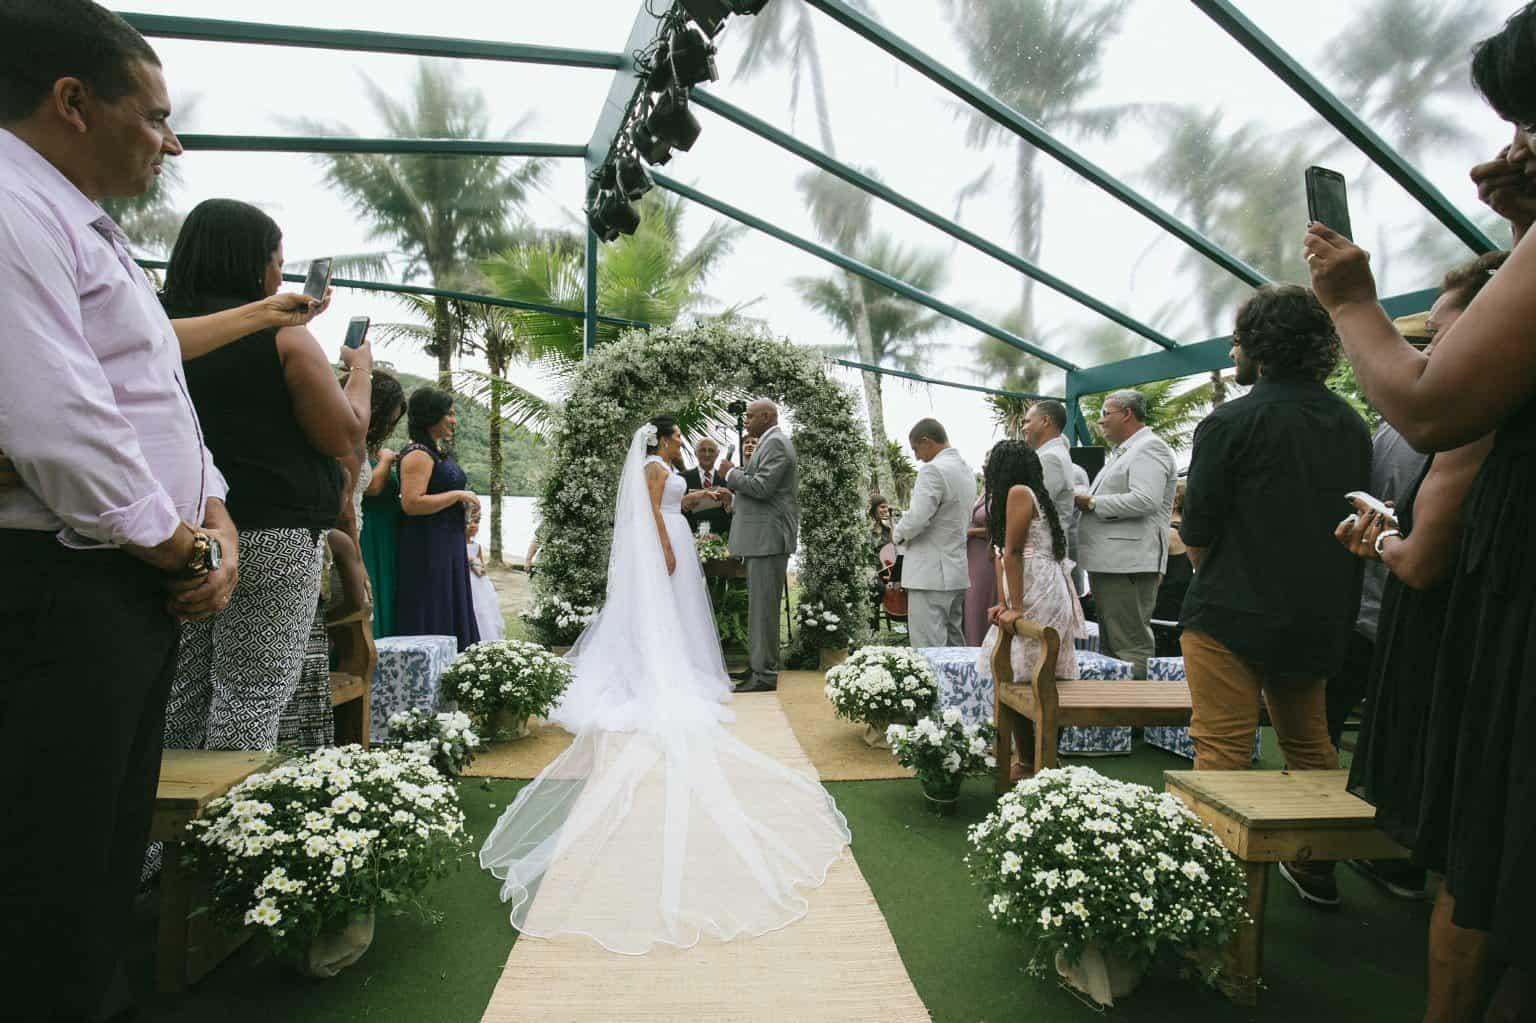 casamento-karina-e-marcos-felizes-para-sempre-caseme-18